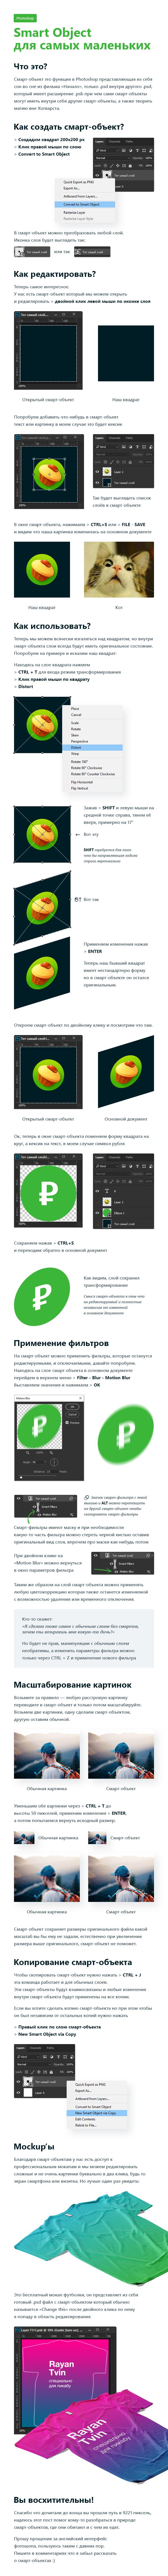 Smart Object в Photoshop для самых маленьких Smart object, Смарт объект, Photoshop, Длиннопост, RayanTvin